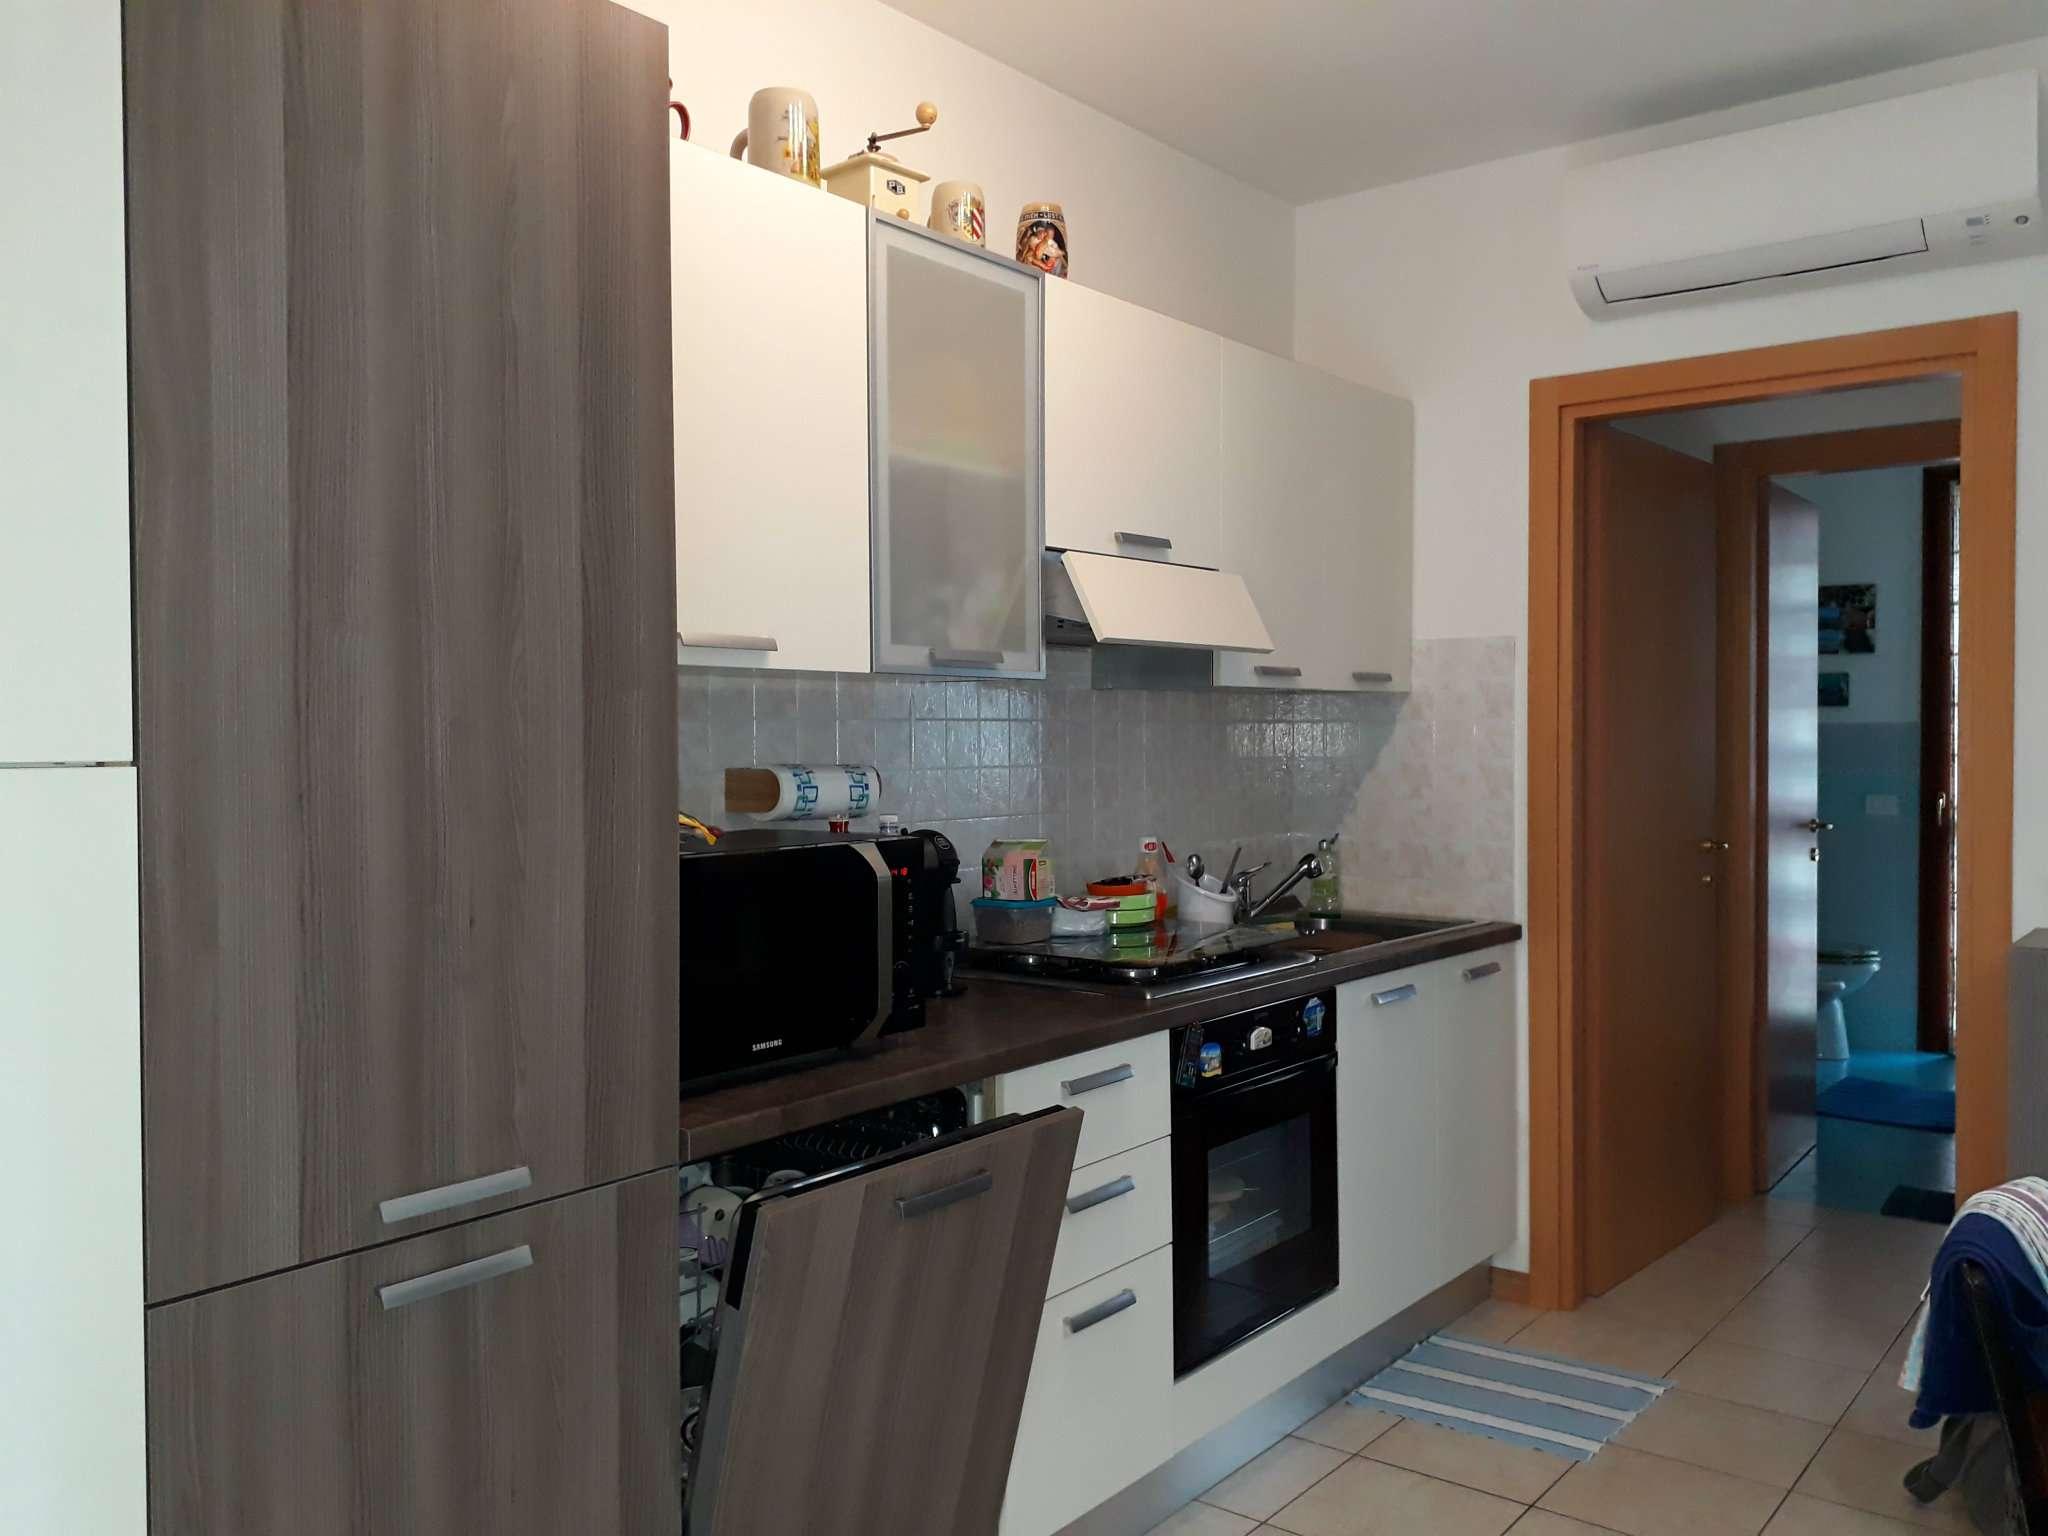 Appartamento in Vendita a Russi Periferia: 2 locali, 59 mq